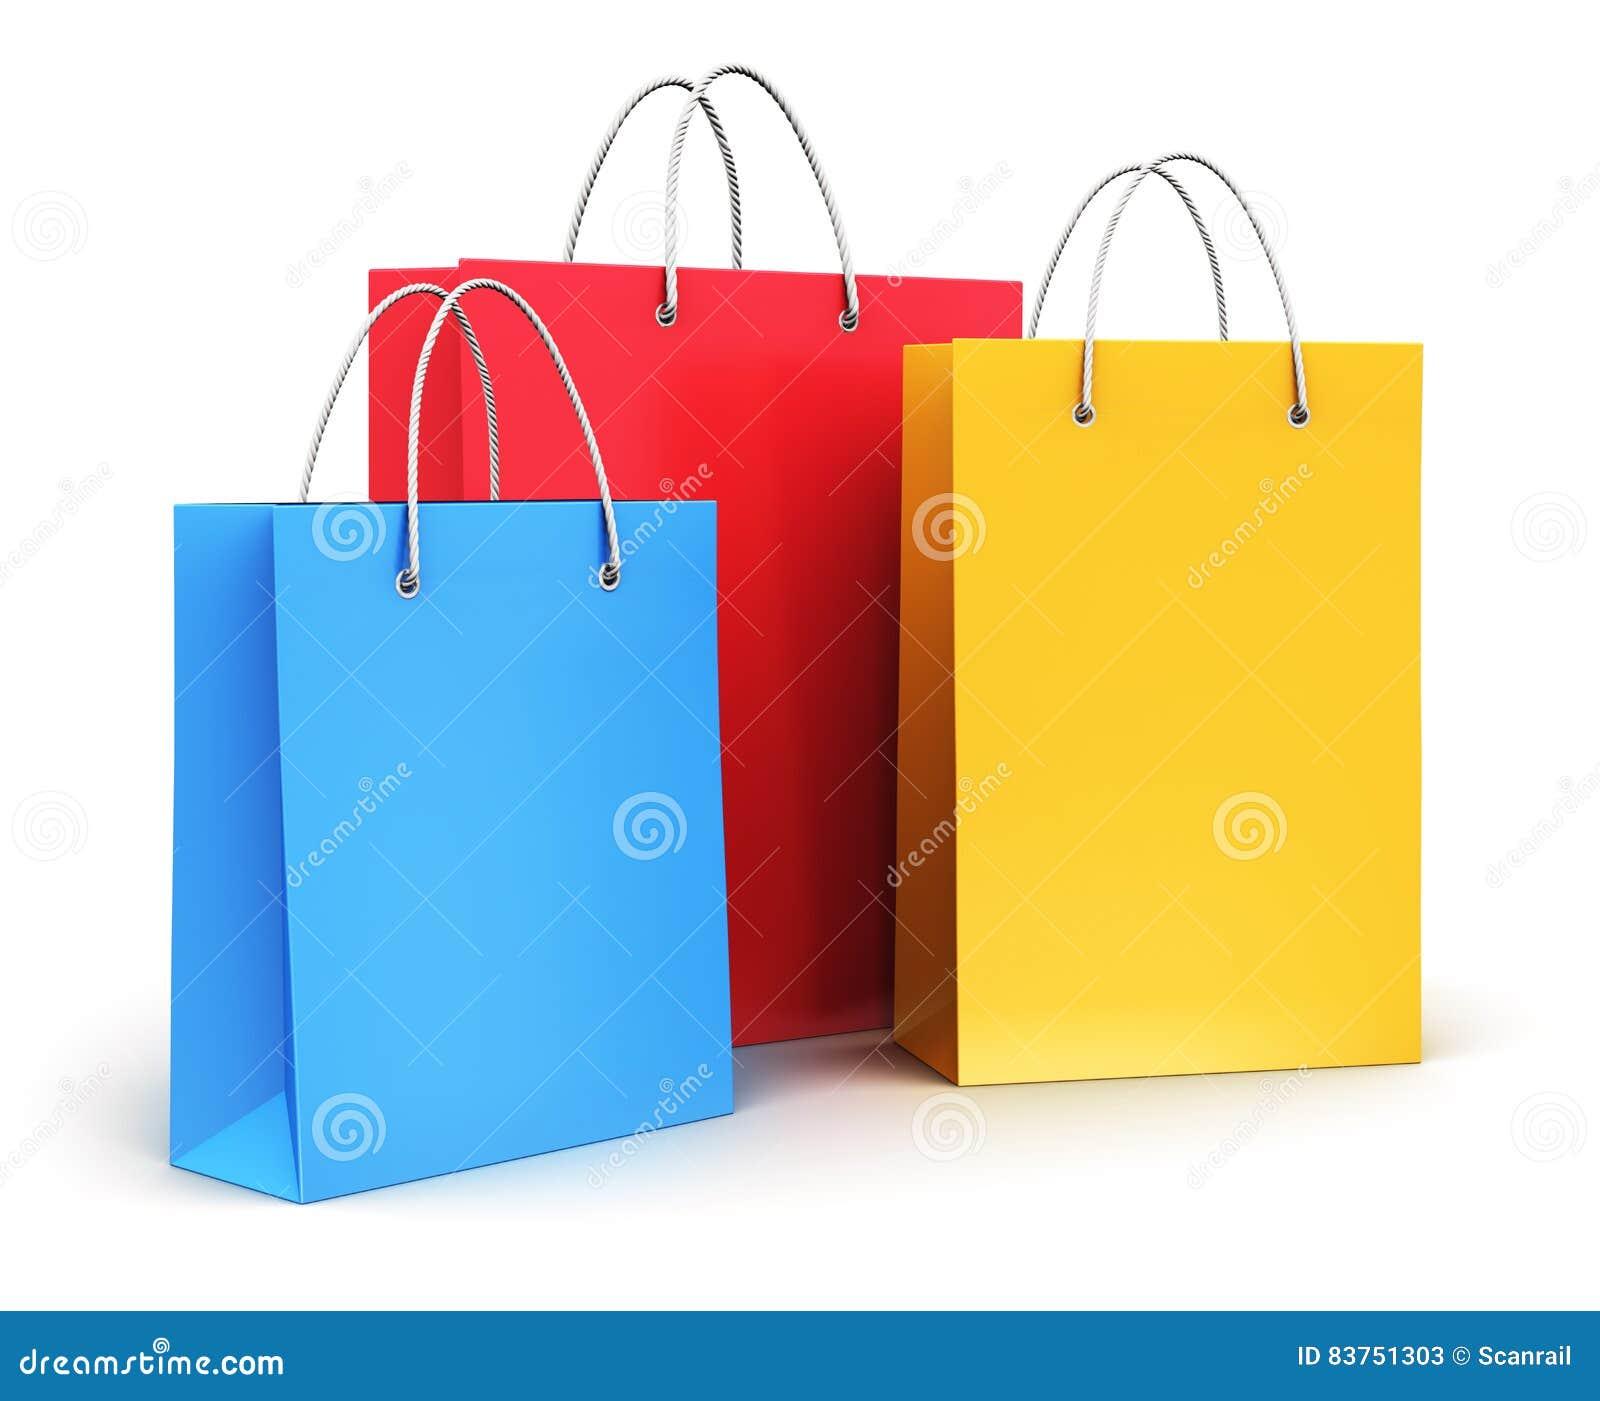 Online shopping luggage